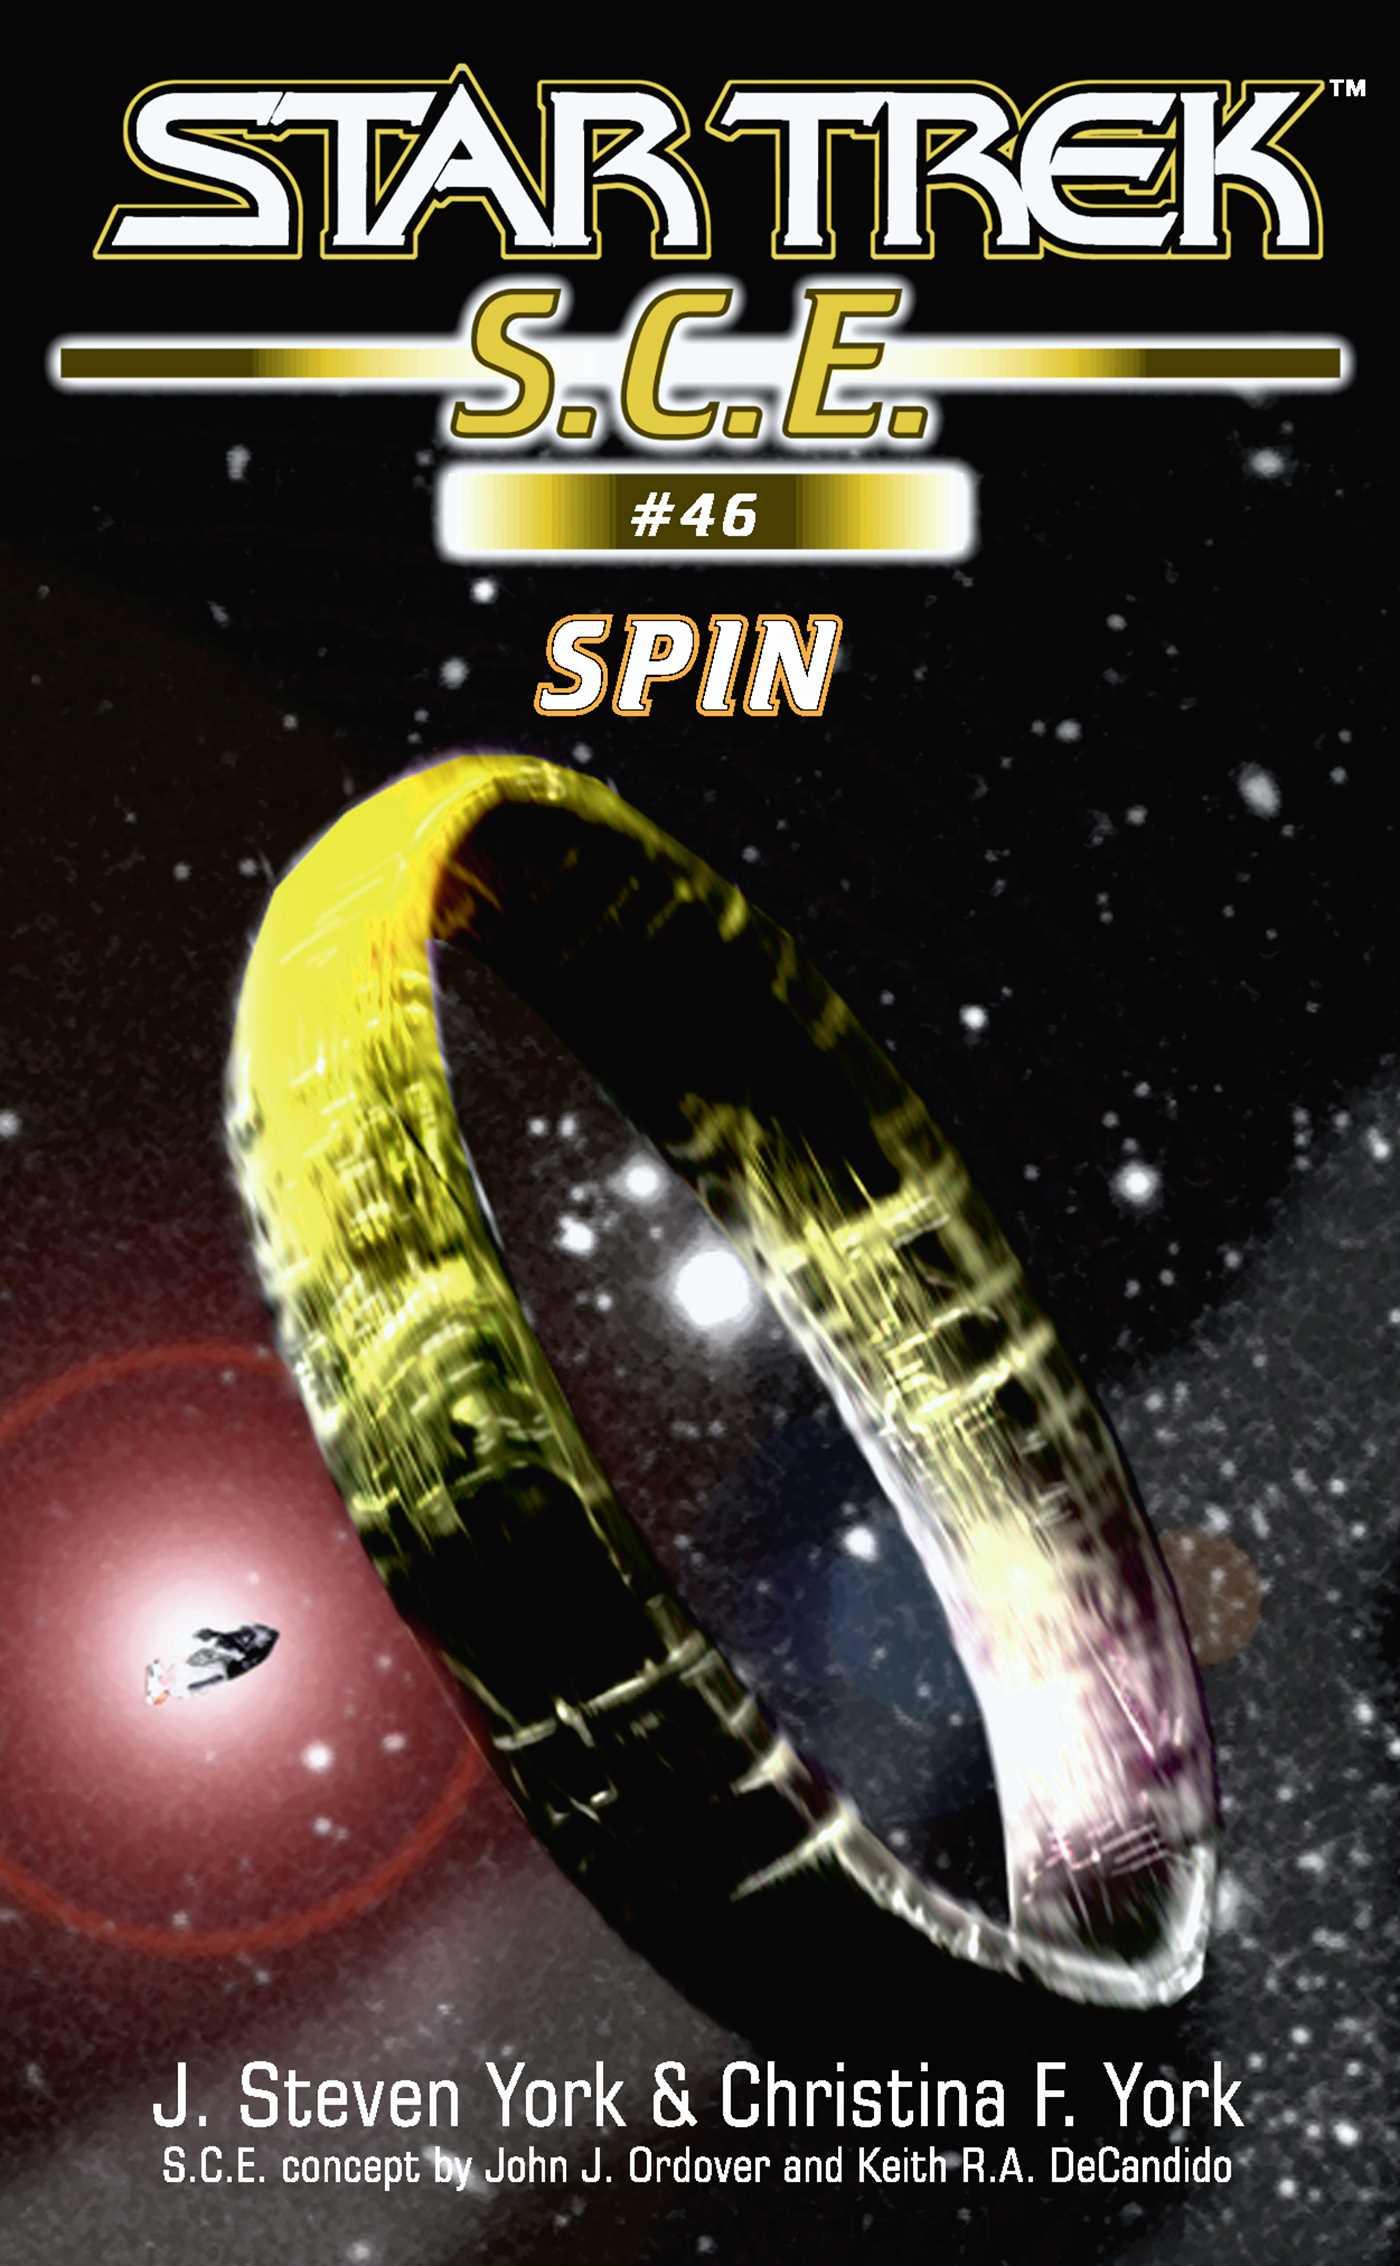 Star trek spin 9780743496872 hr